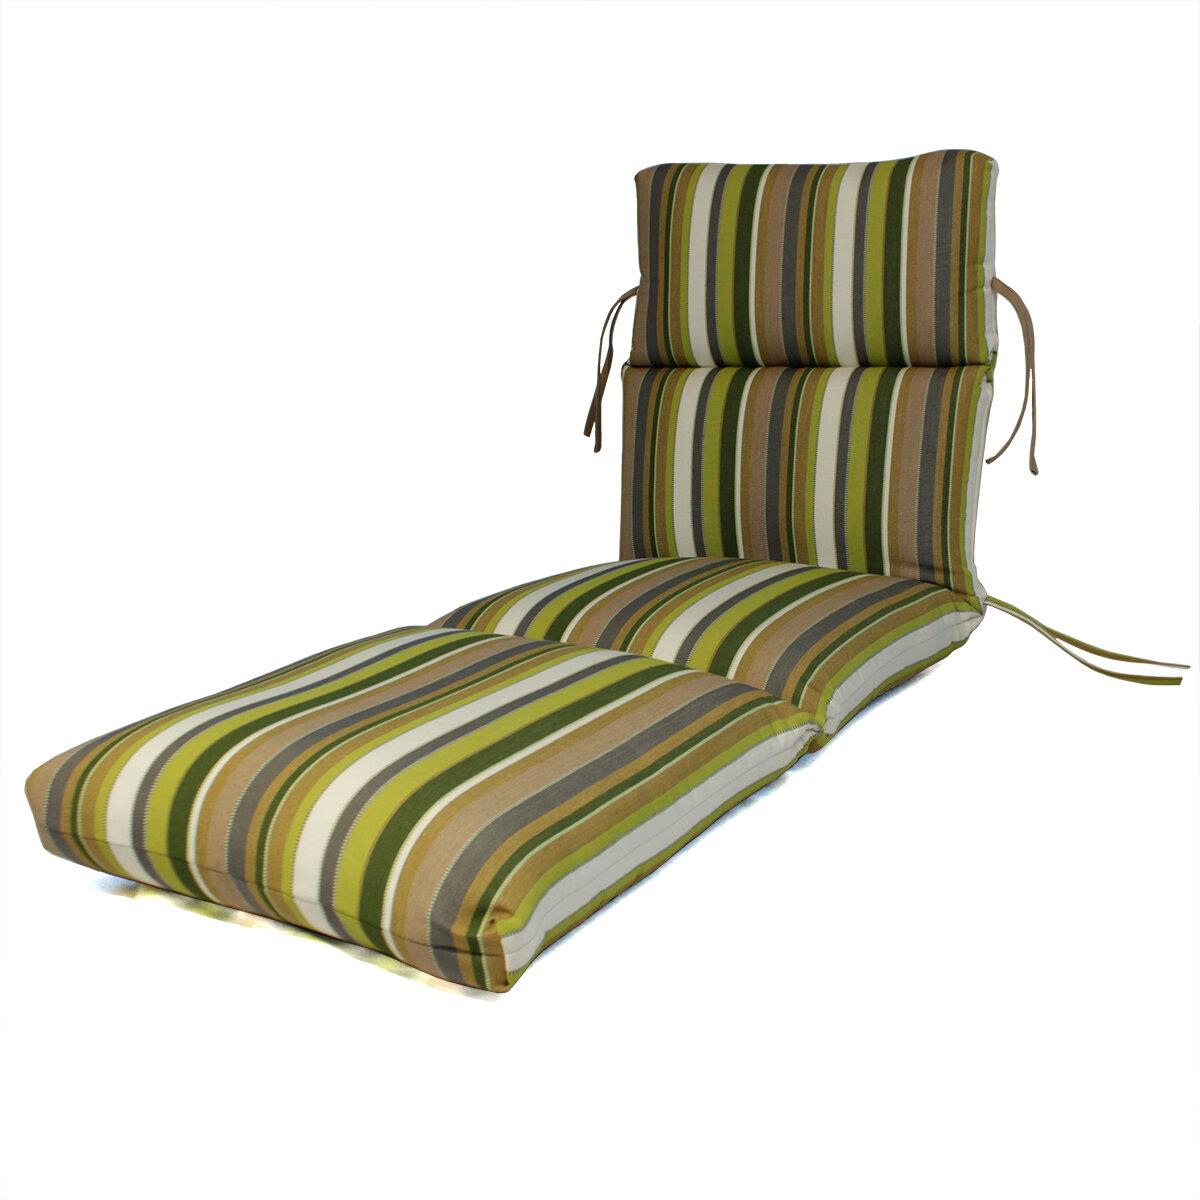 Comfort classics inc channeled outdoor sunbrella chaise for Chaise cushions sunbrella